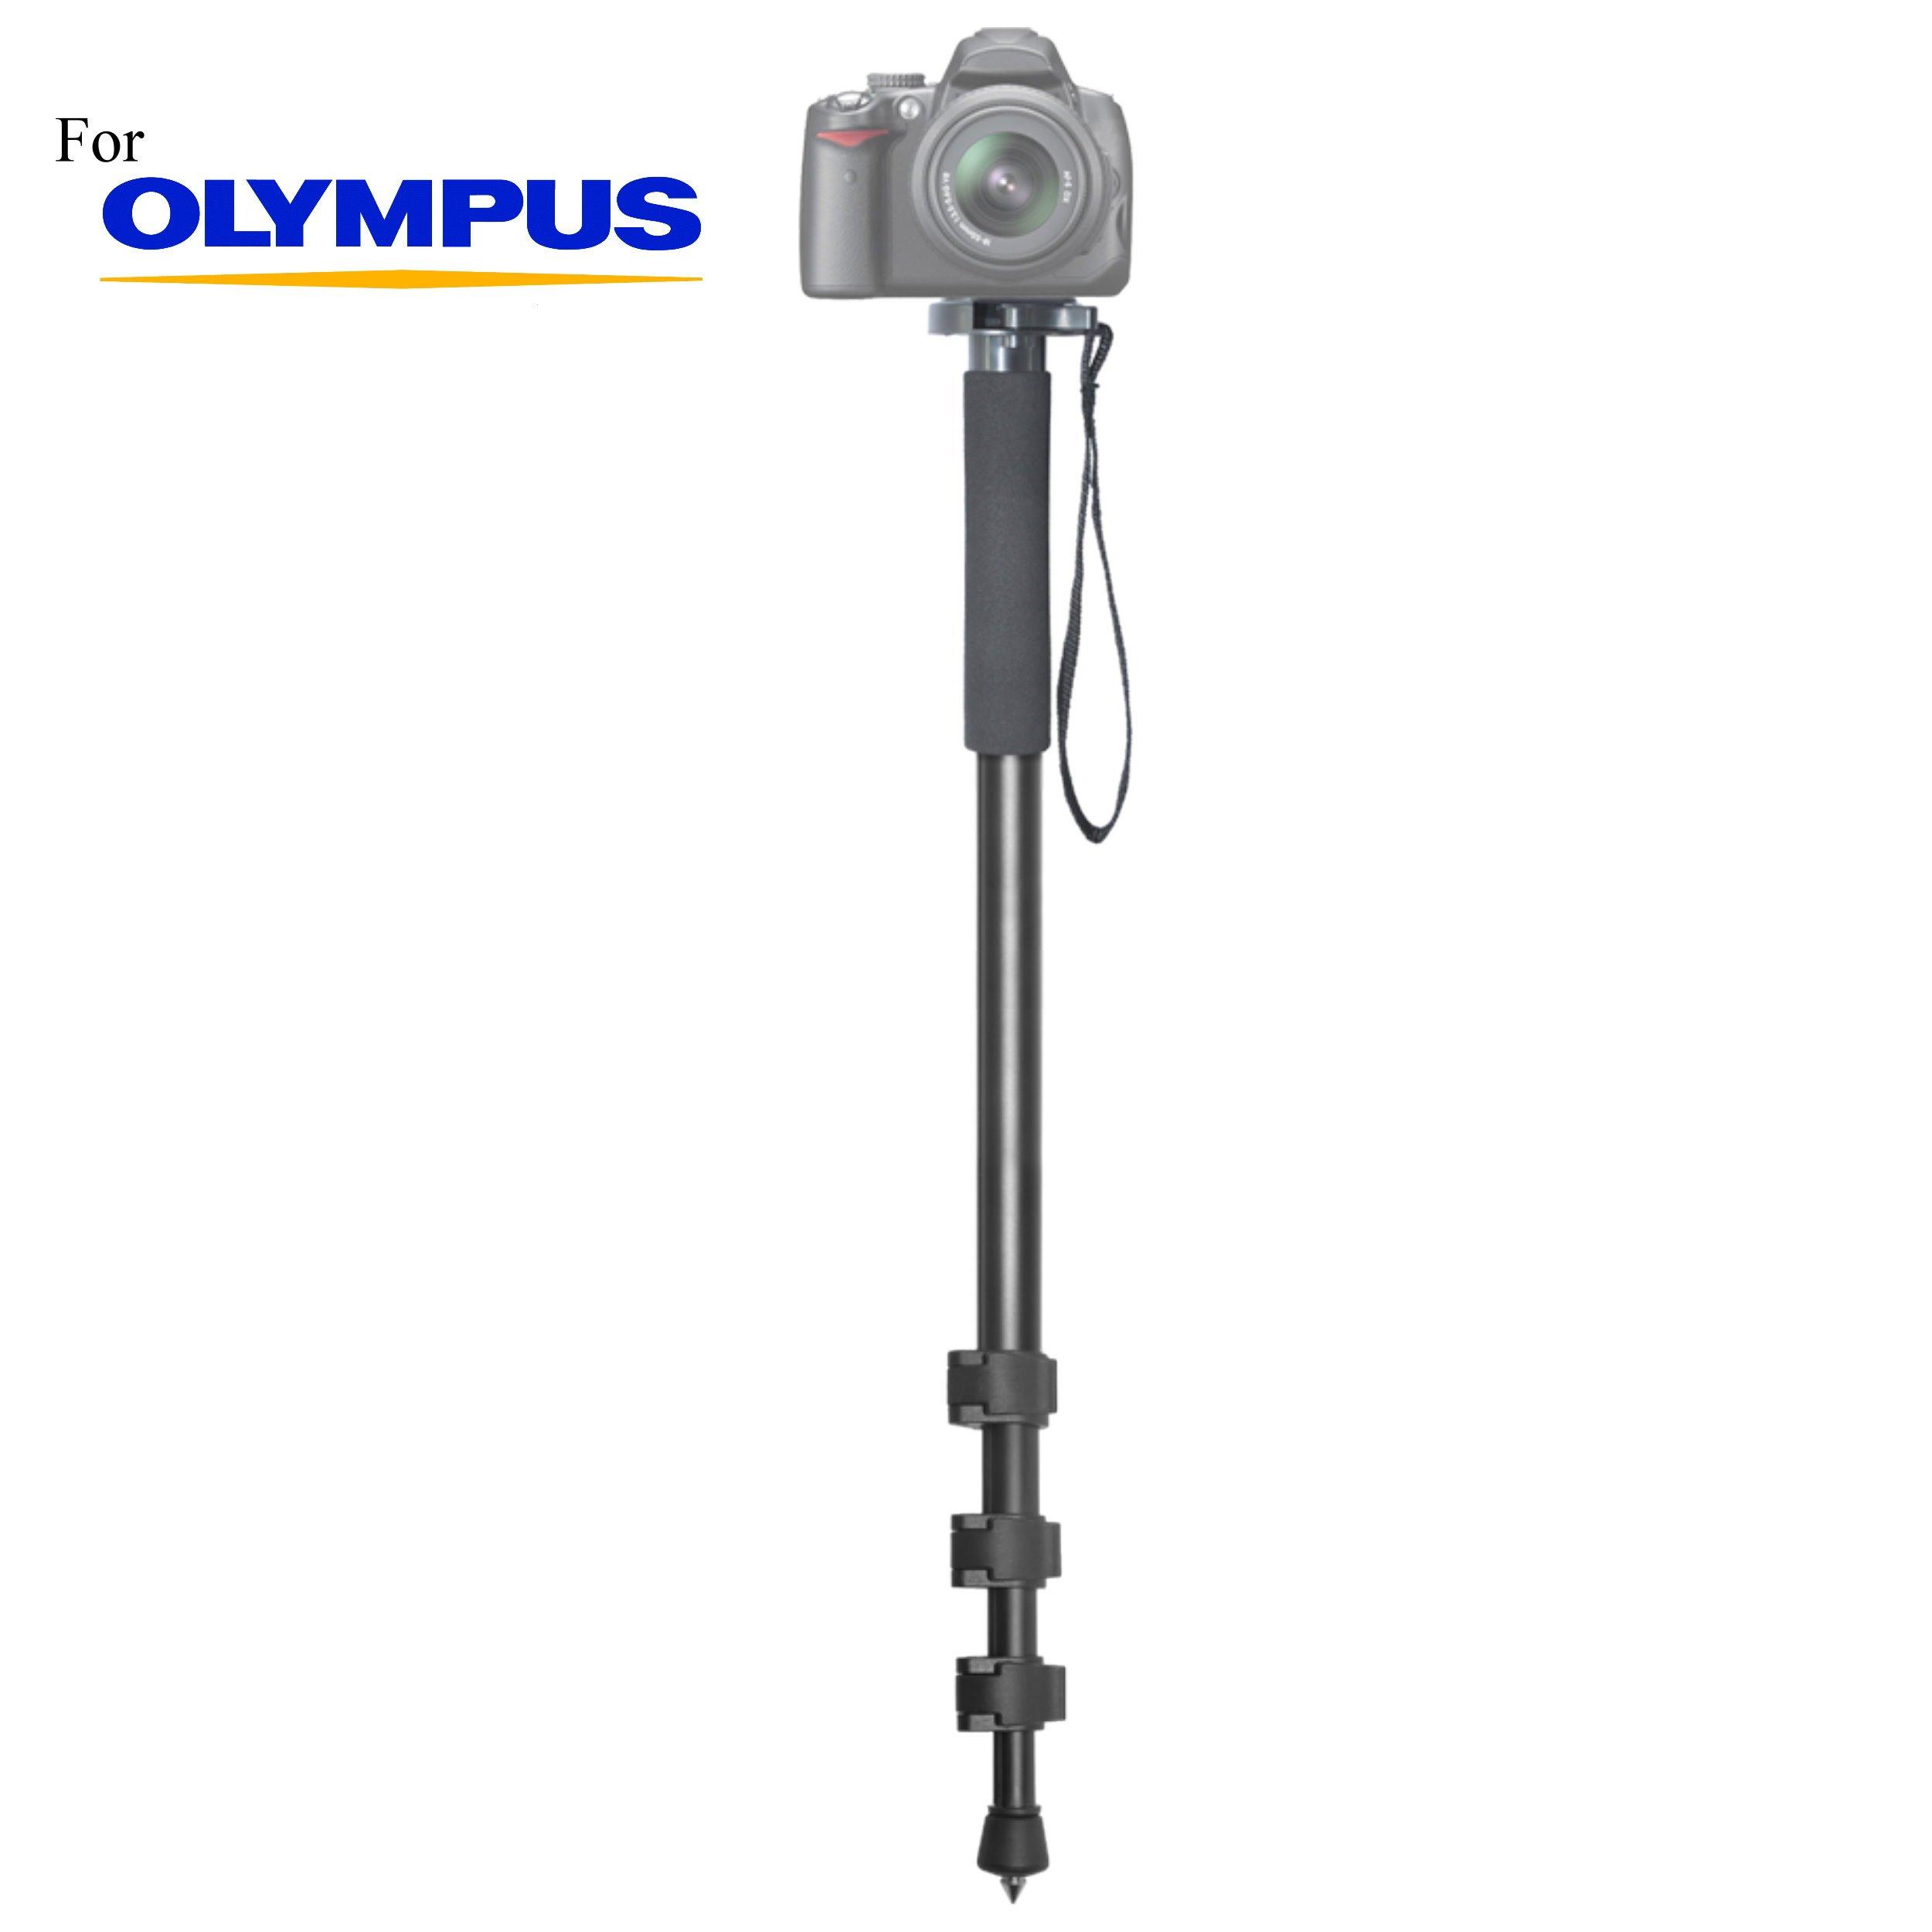 Versatile 72'' Monopod Camera Stick + Quick Release for Olympus SP-565UZ, SP-570 UZ, Stylus 1, Stylus 1s, XZ-1, XZ-2 iHS, E-400 Pro Digital Cameras: Collapsible Mono pod, Mono-pod by IDU-PRO